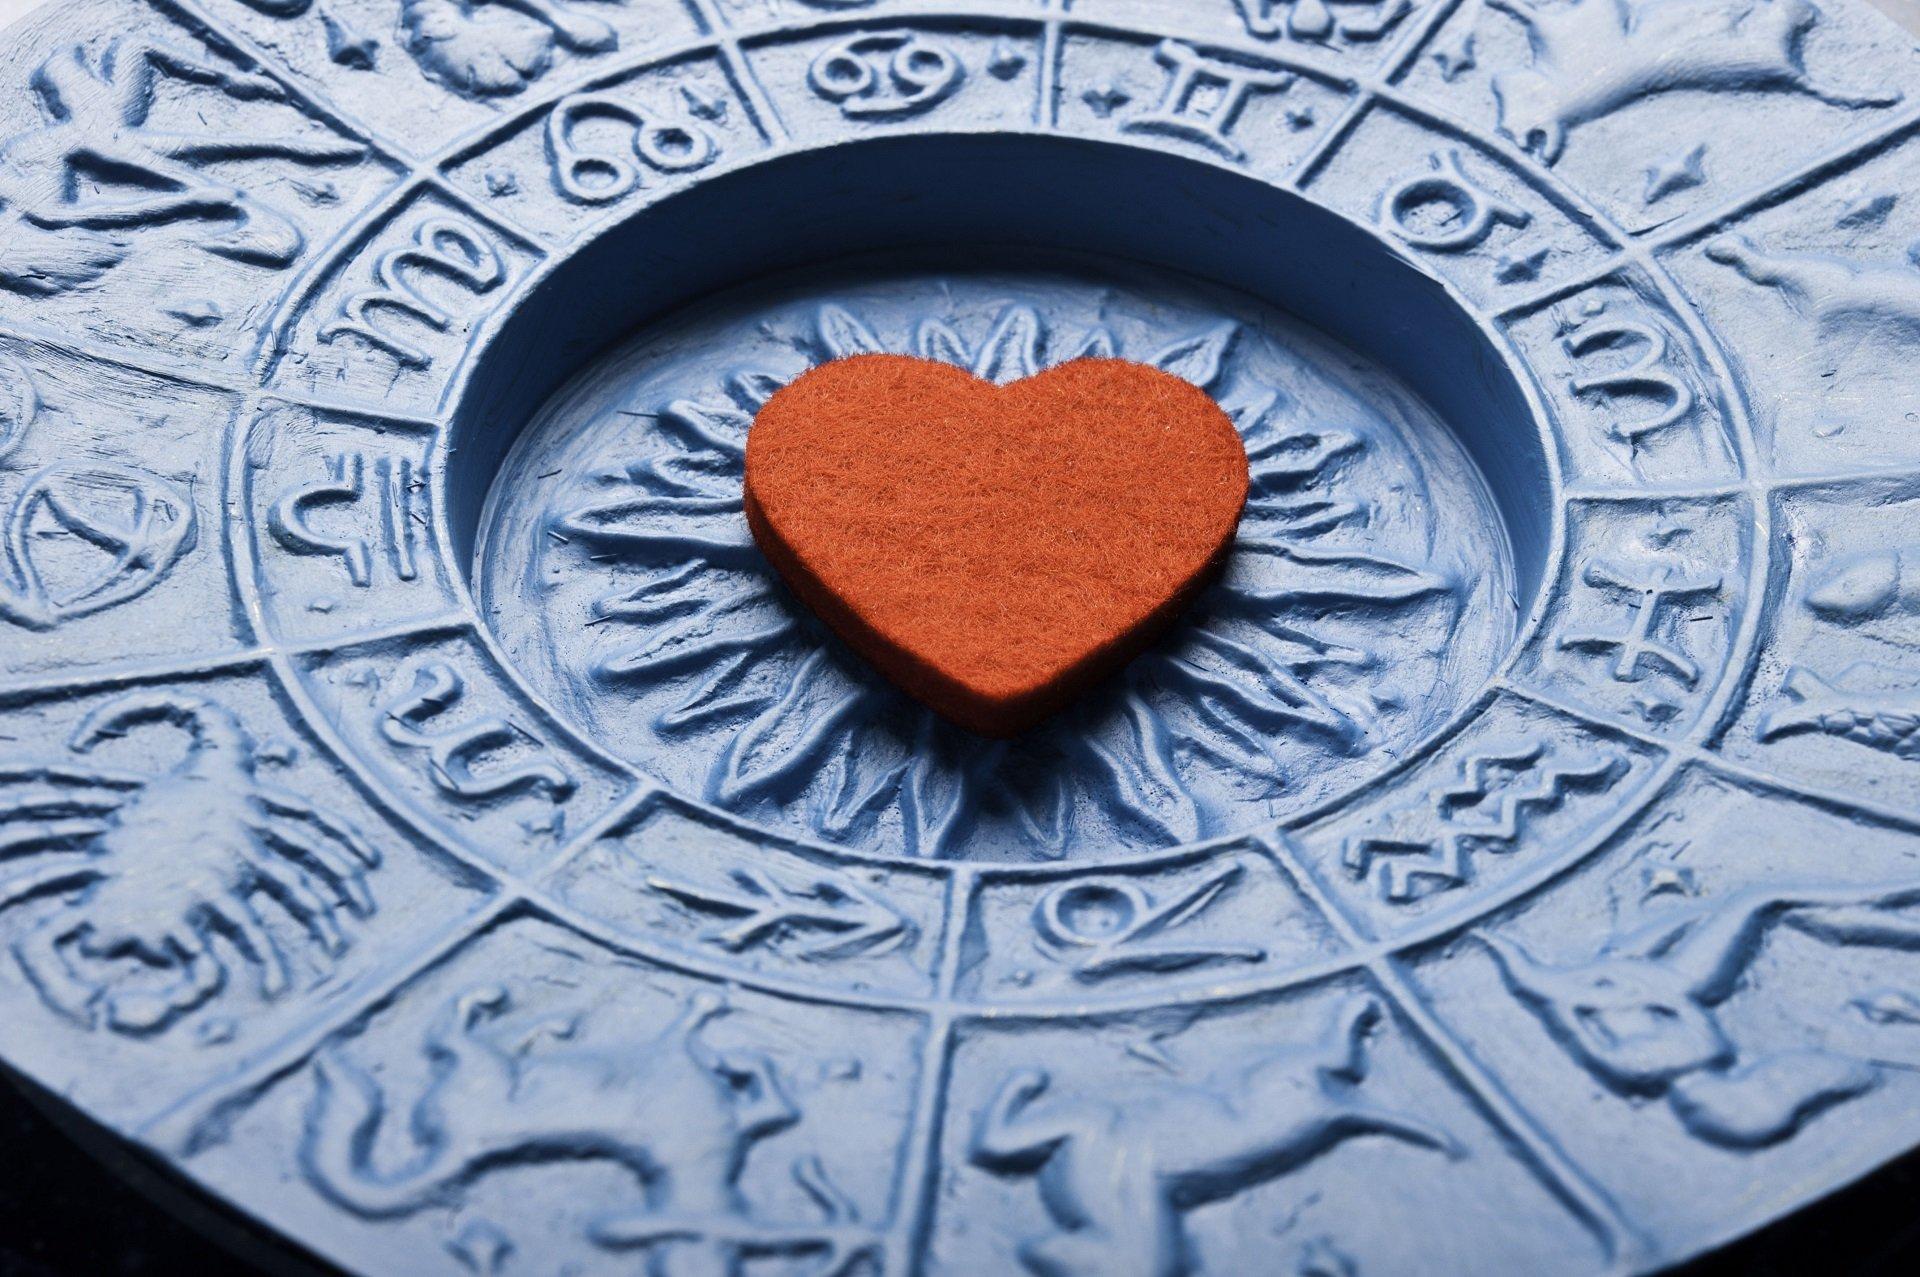 Corazón sobre platón astrológico || Fuente: Shutterstock